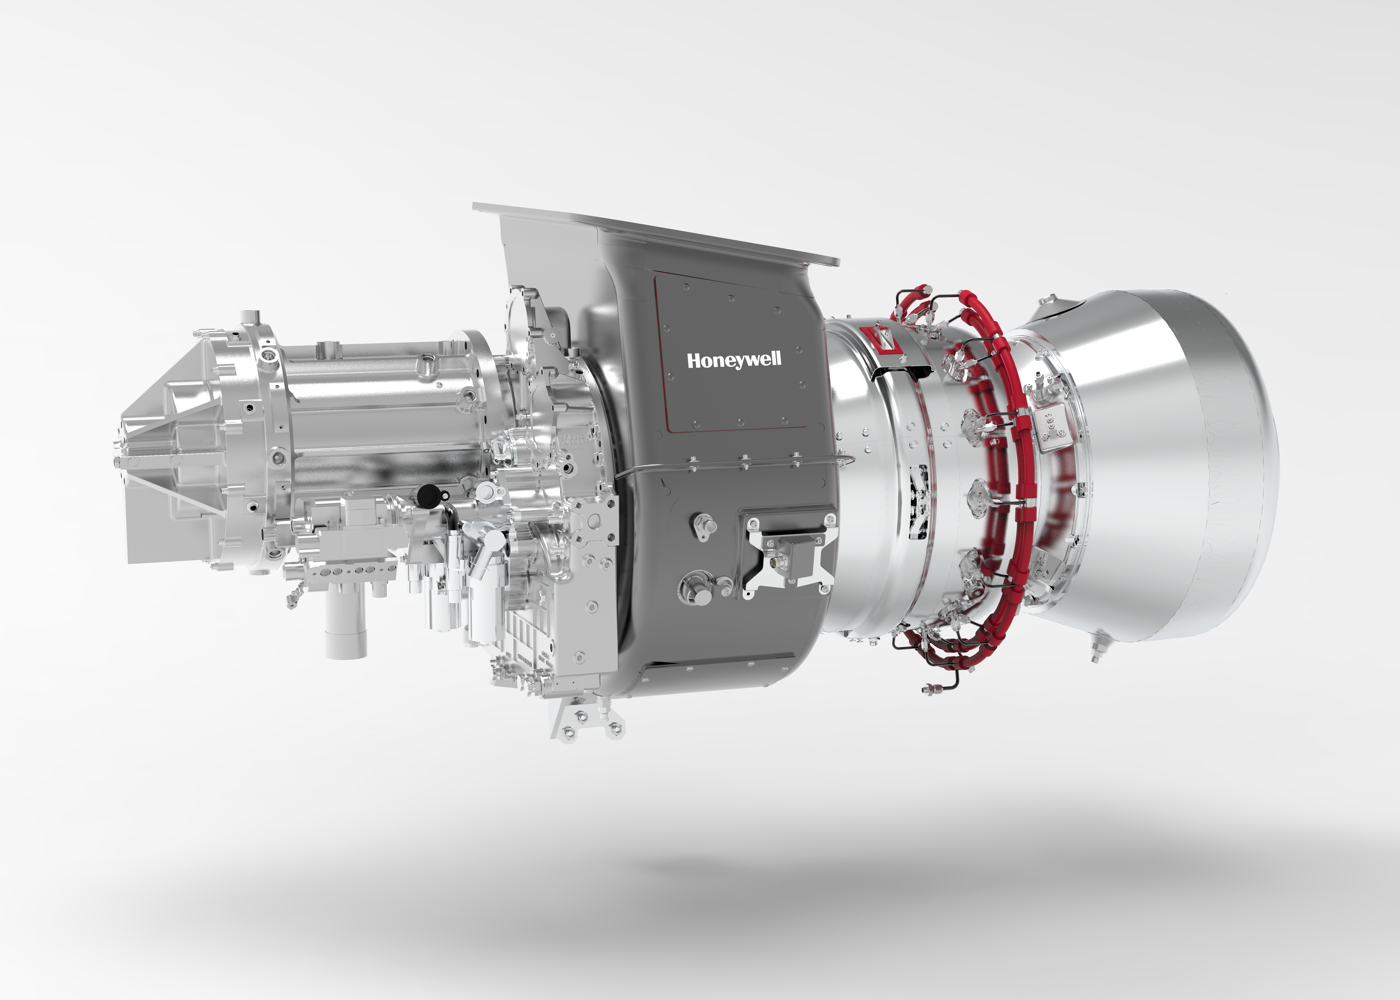 Honeywell turbogenerator